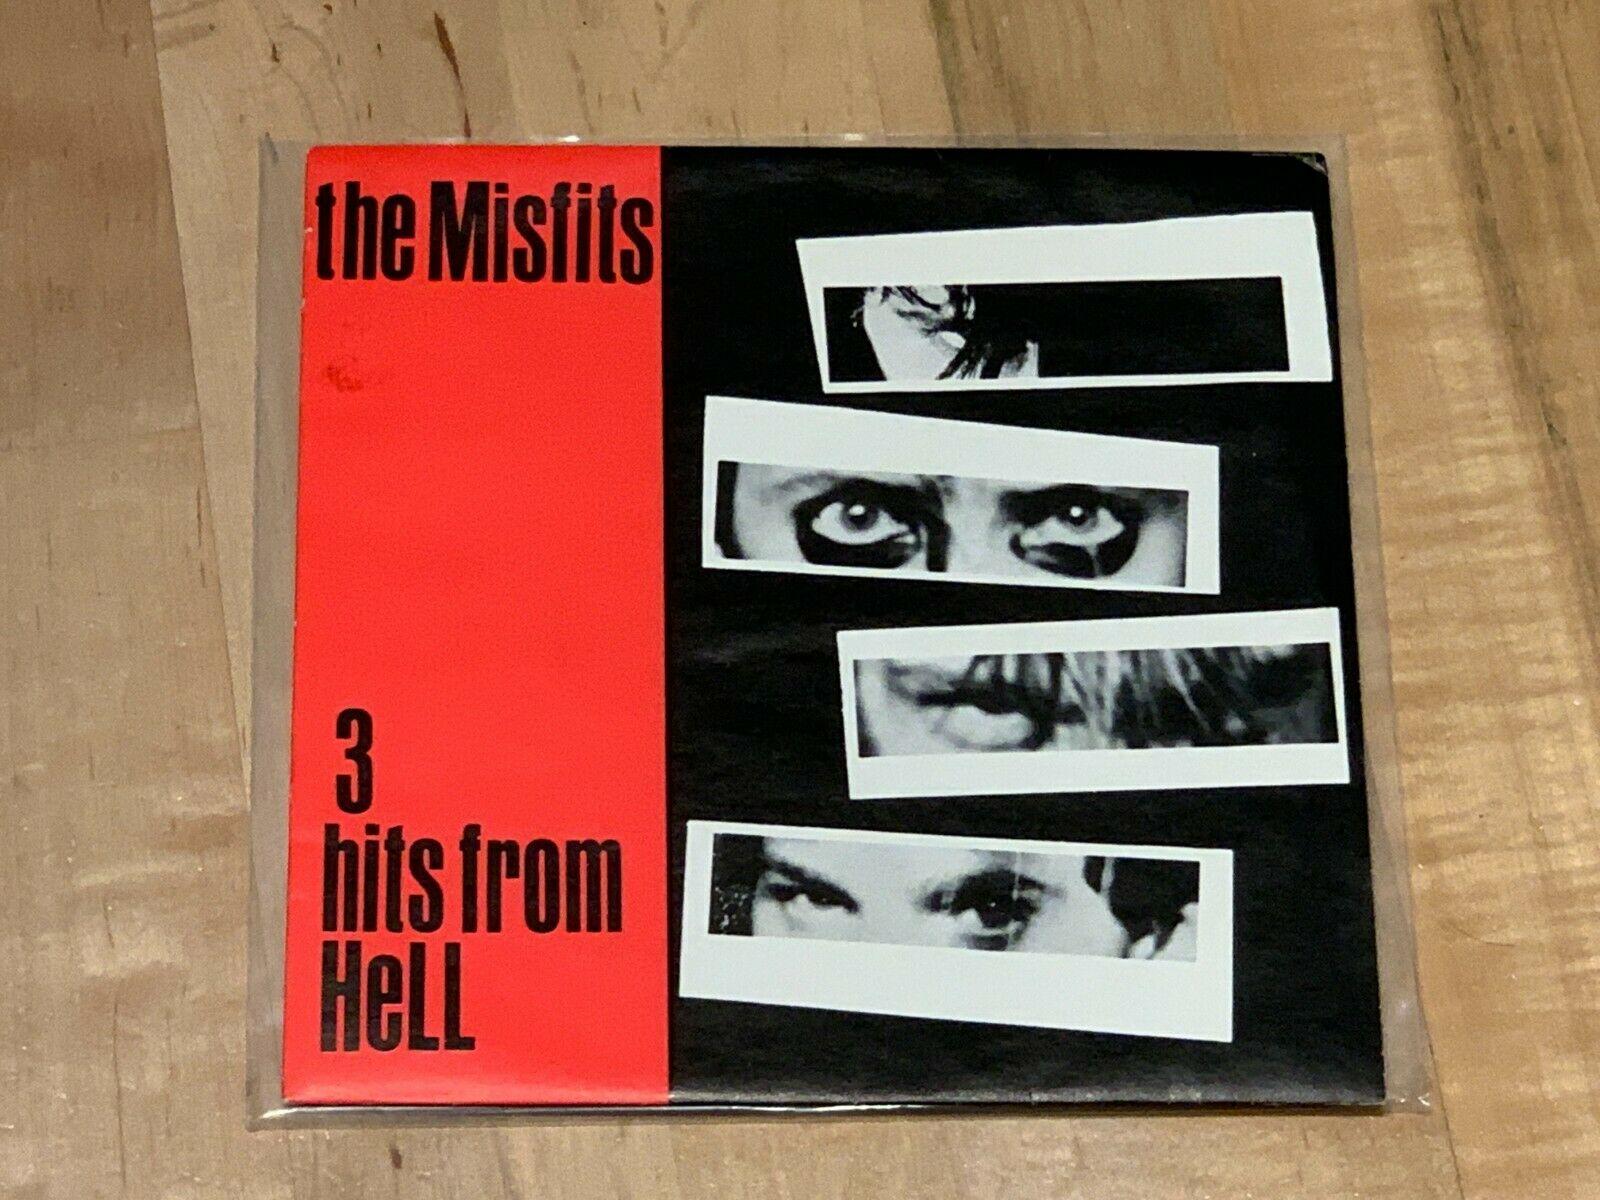 Misfits 3 Hits From Hell 7  Grey Label Original Plan 9 Records Samhain Danzig